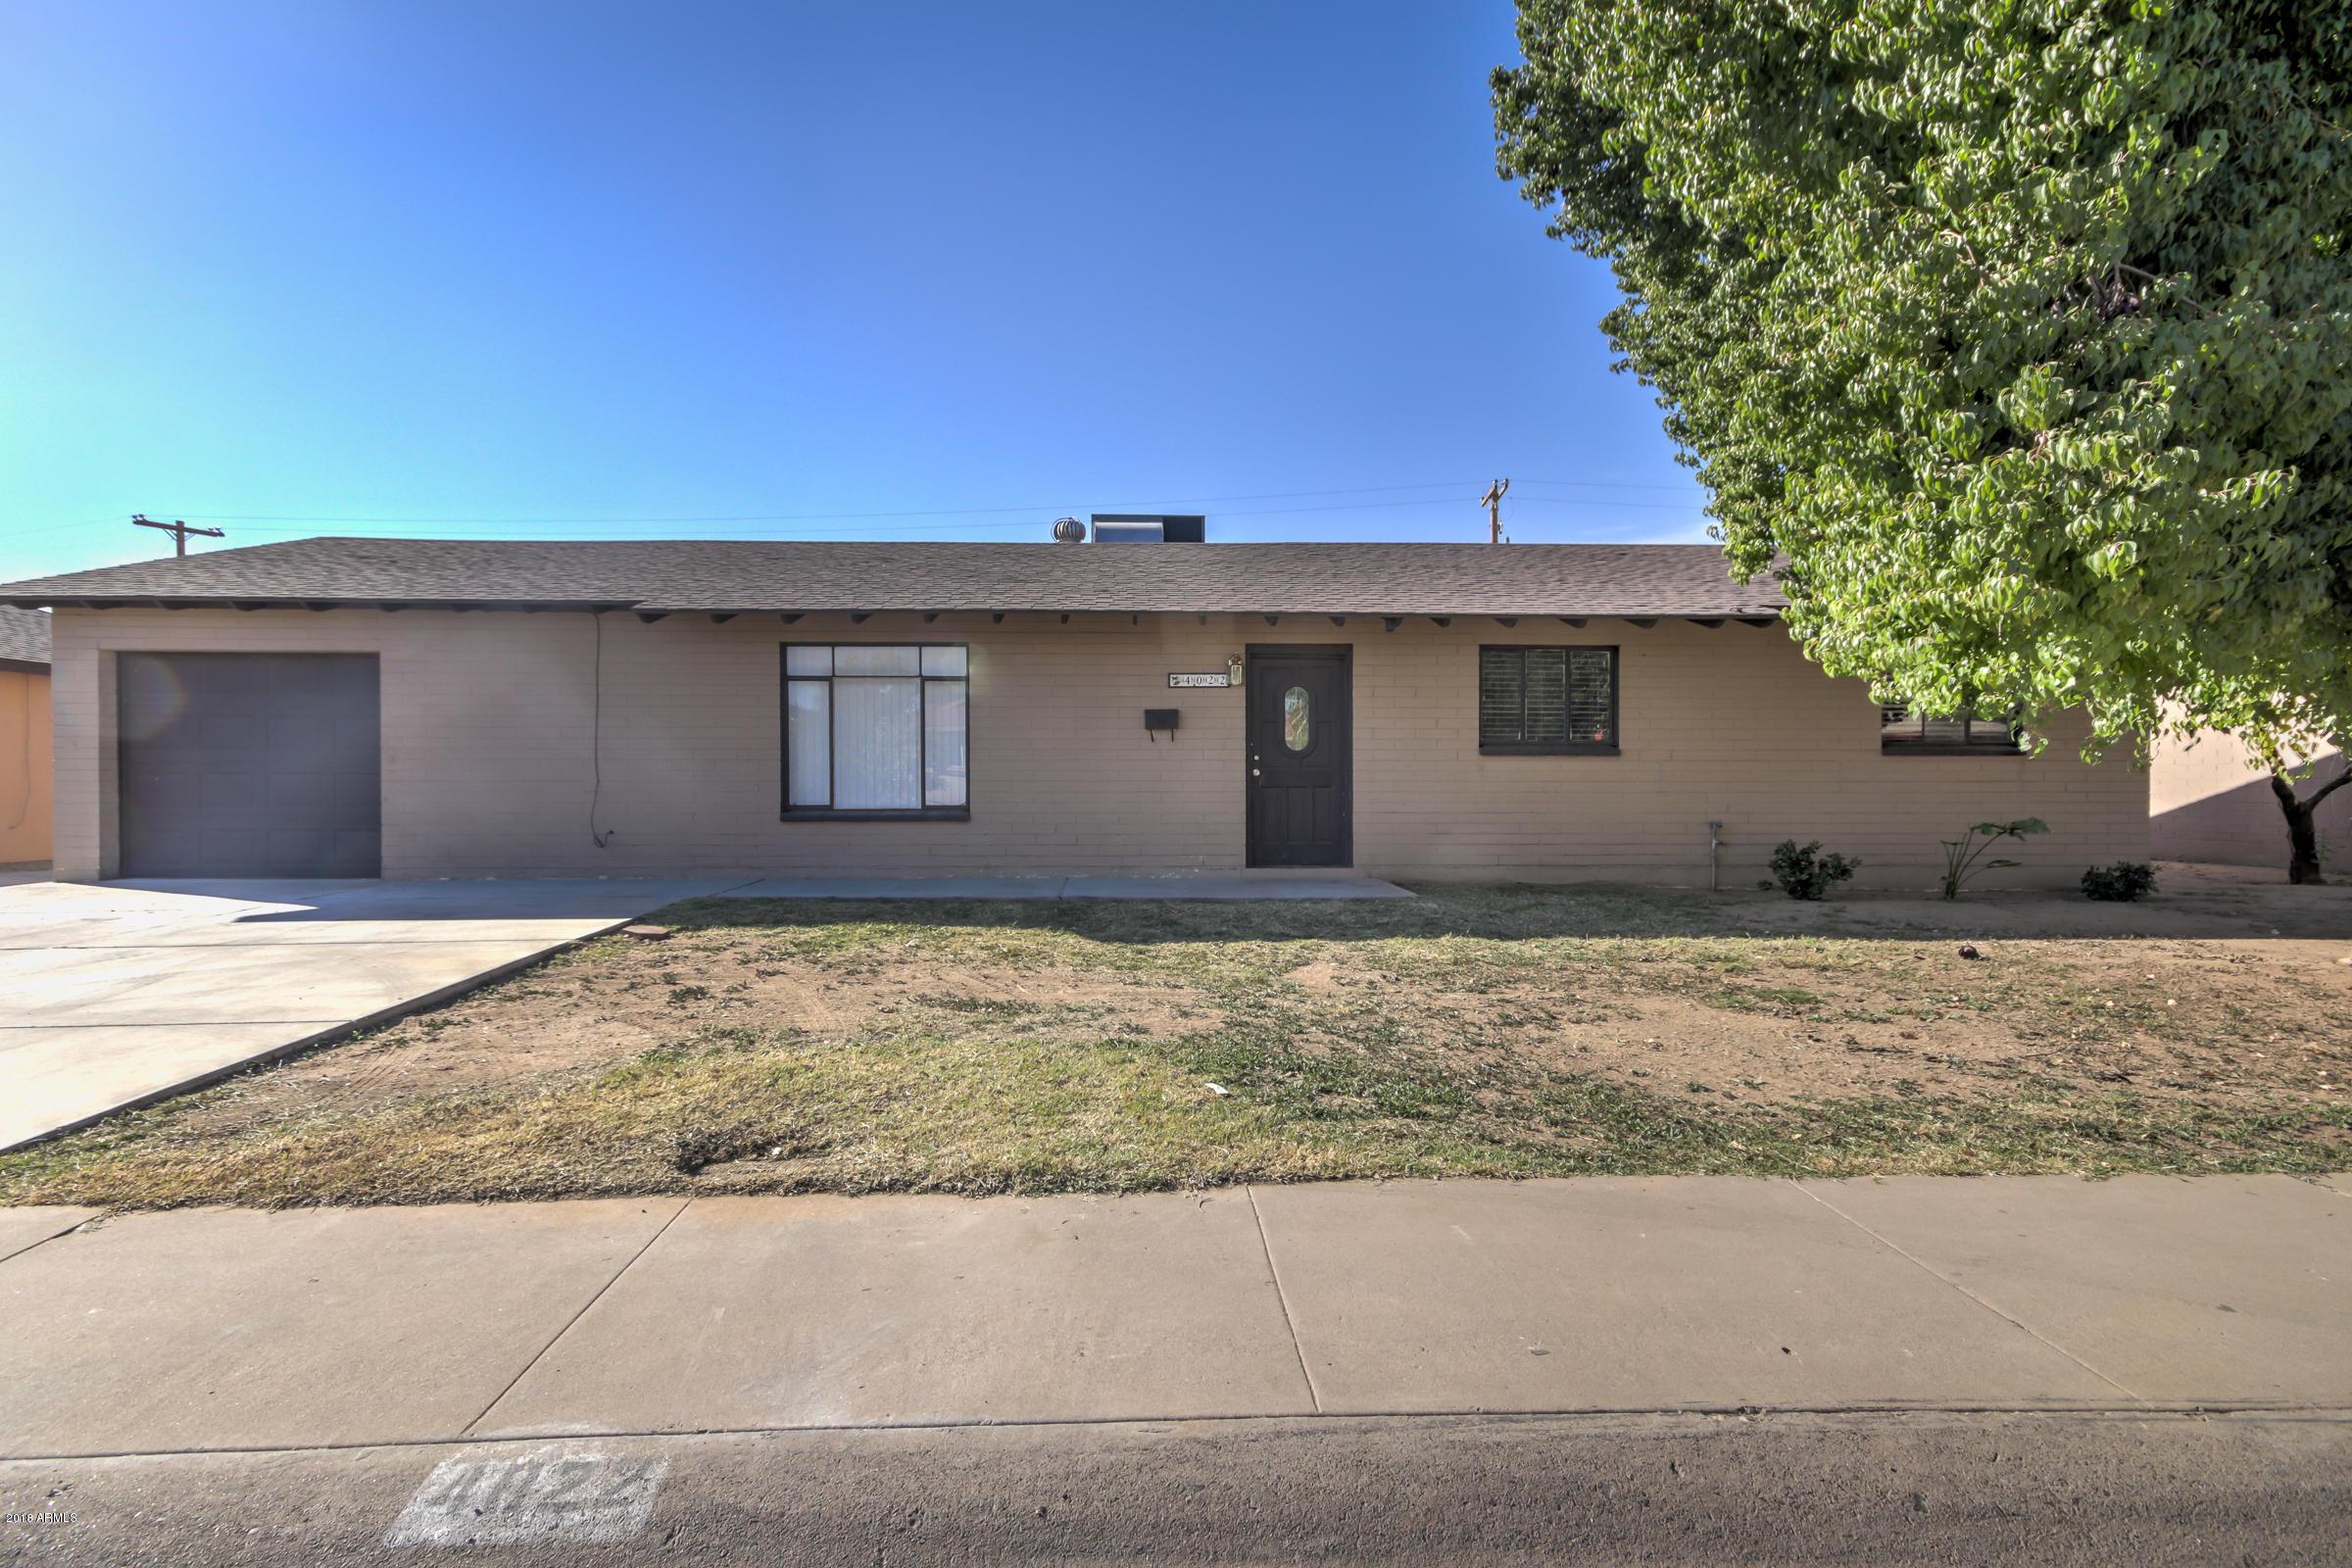 Photo of 4022 N 55TH Drive, Phoenix, AZ 85031